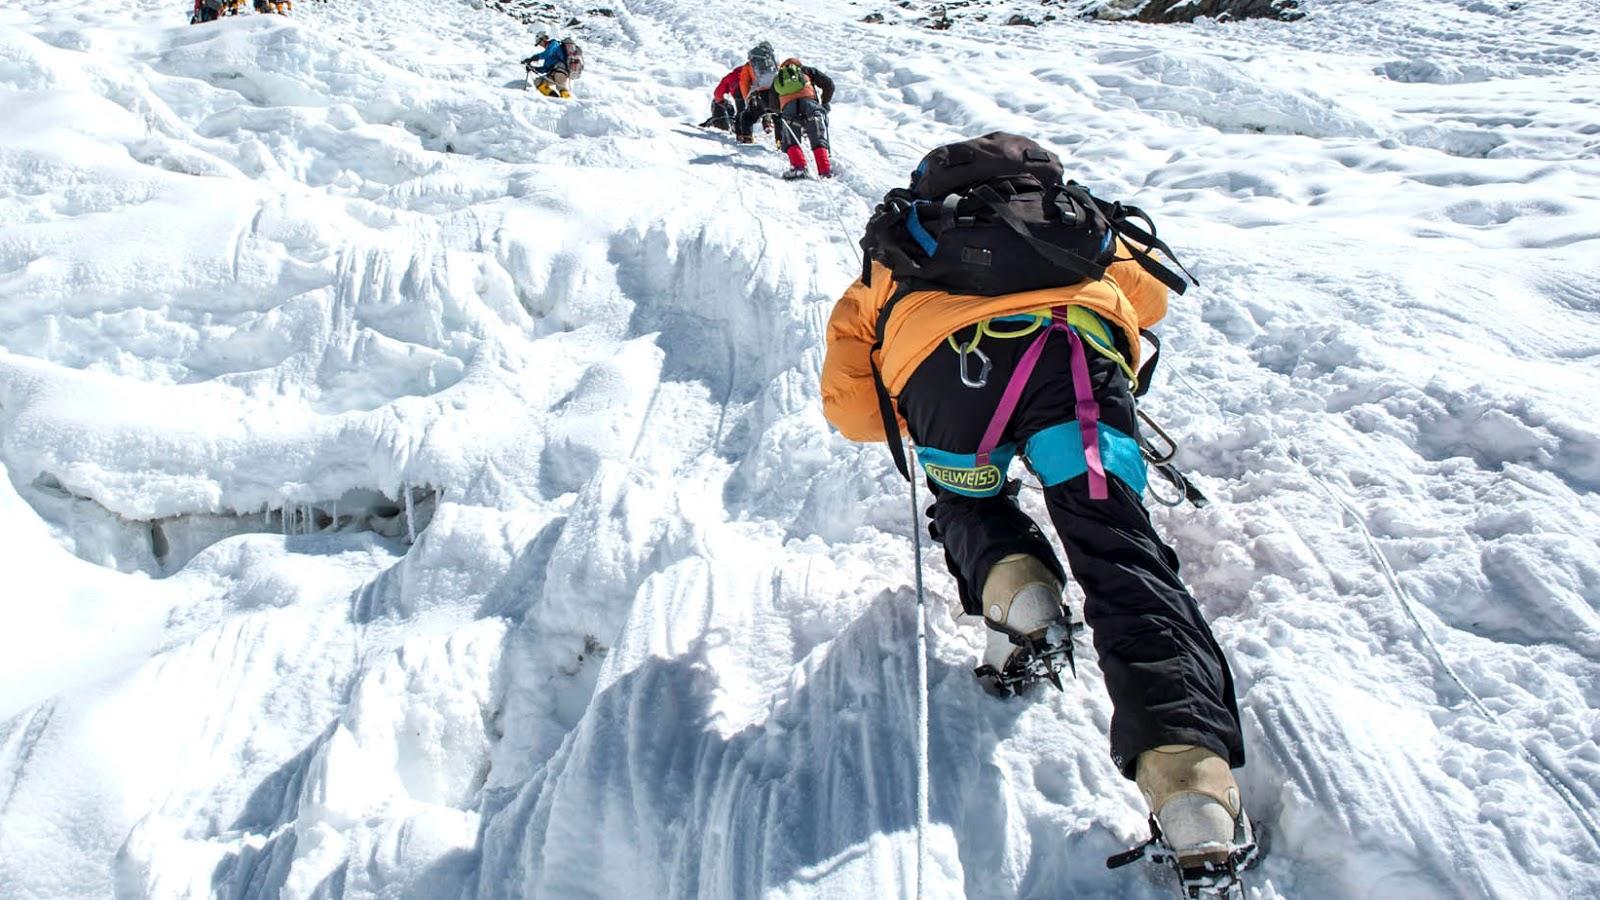 5 pendaki gunung merbabu 6 pendaki gunung guntur tersambar petir   pendaki gunung cilik  pendaki gunung dengan sepeda ontel pendaki gunung di wonosobo tersambar petir   pendaki gunung fuji